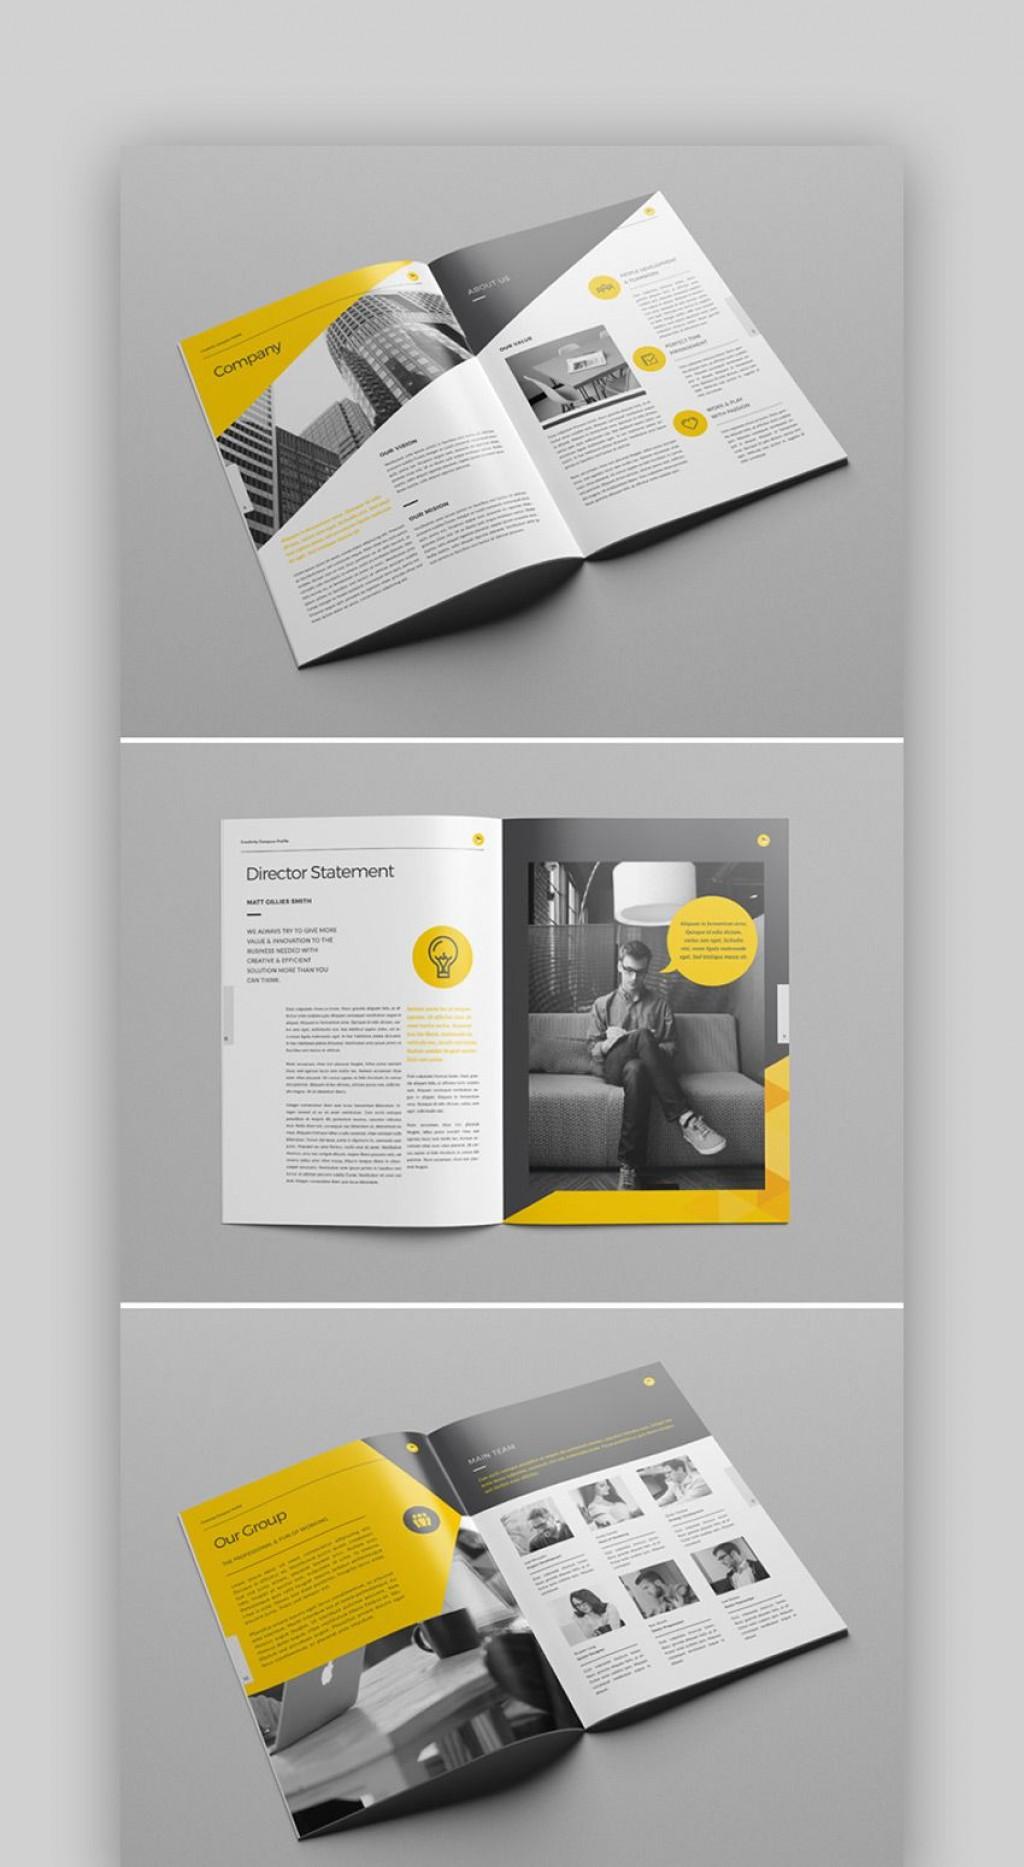 009 Imposing Adobe Indesign Brochure Template Free Download Design Large